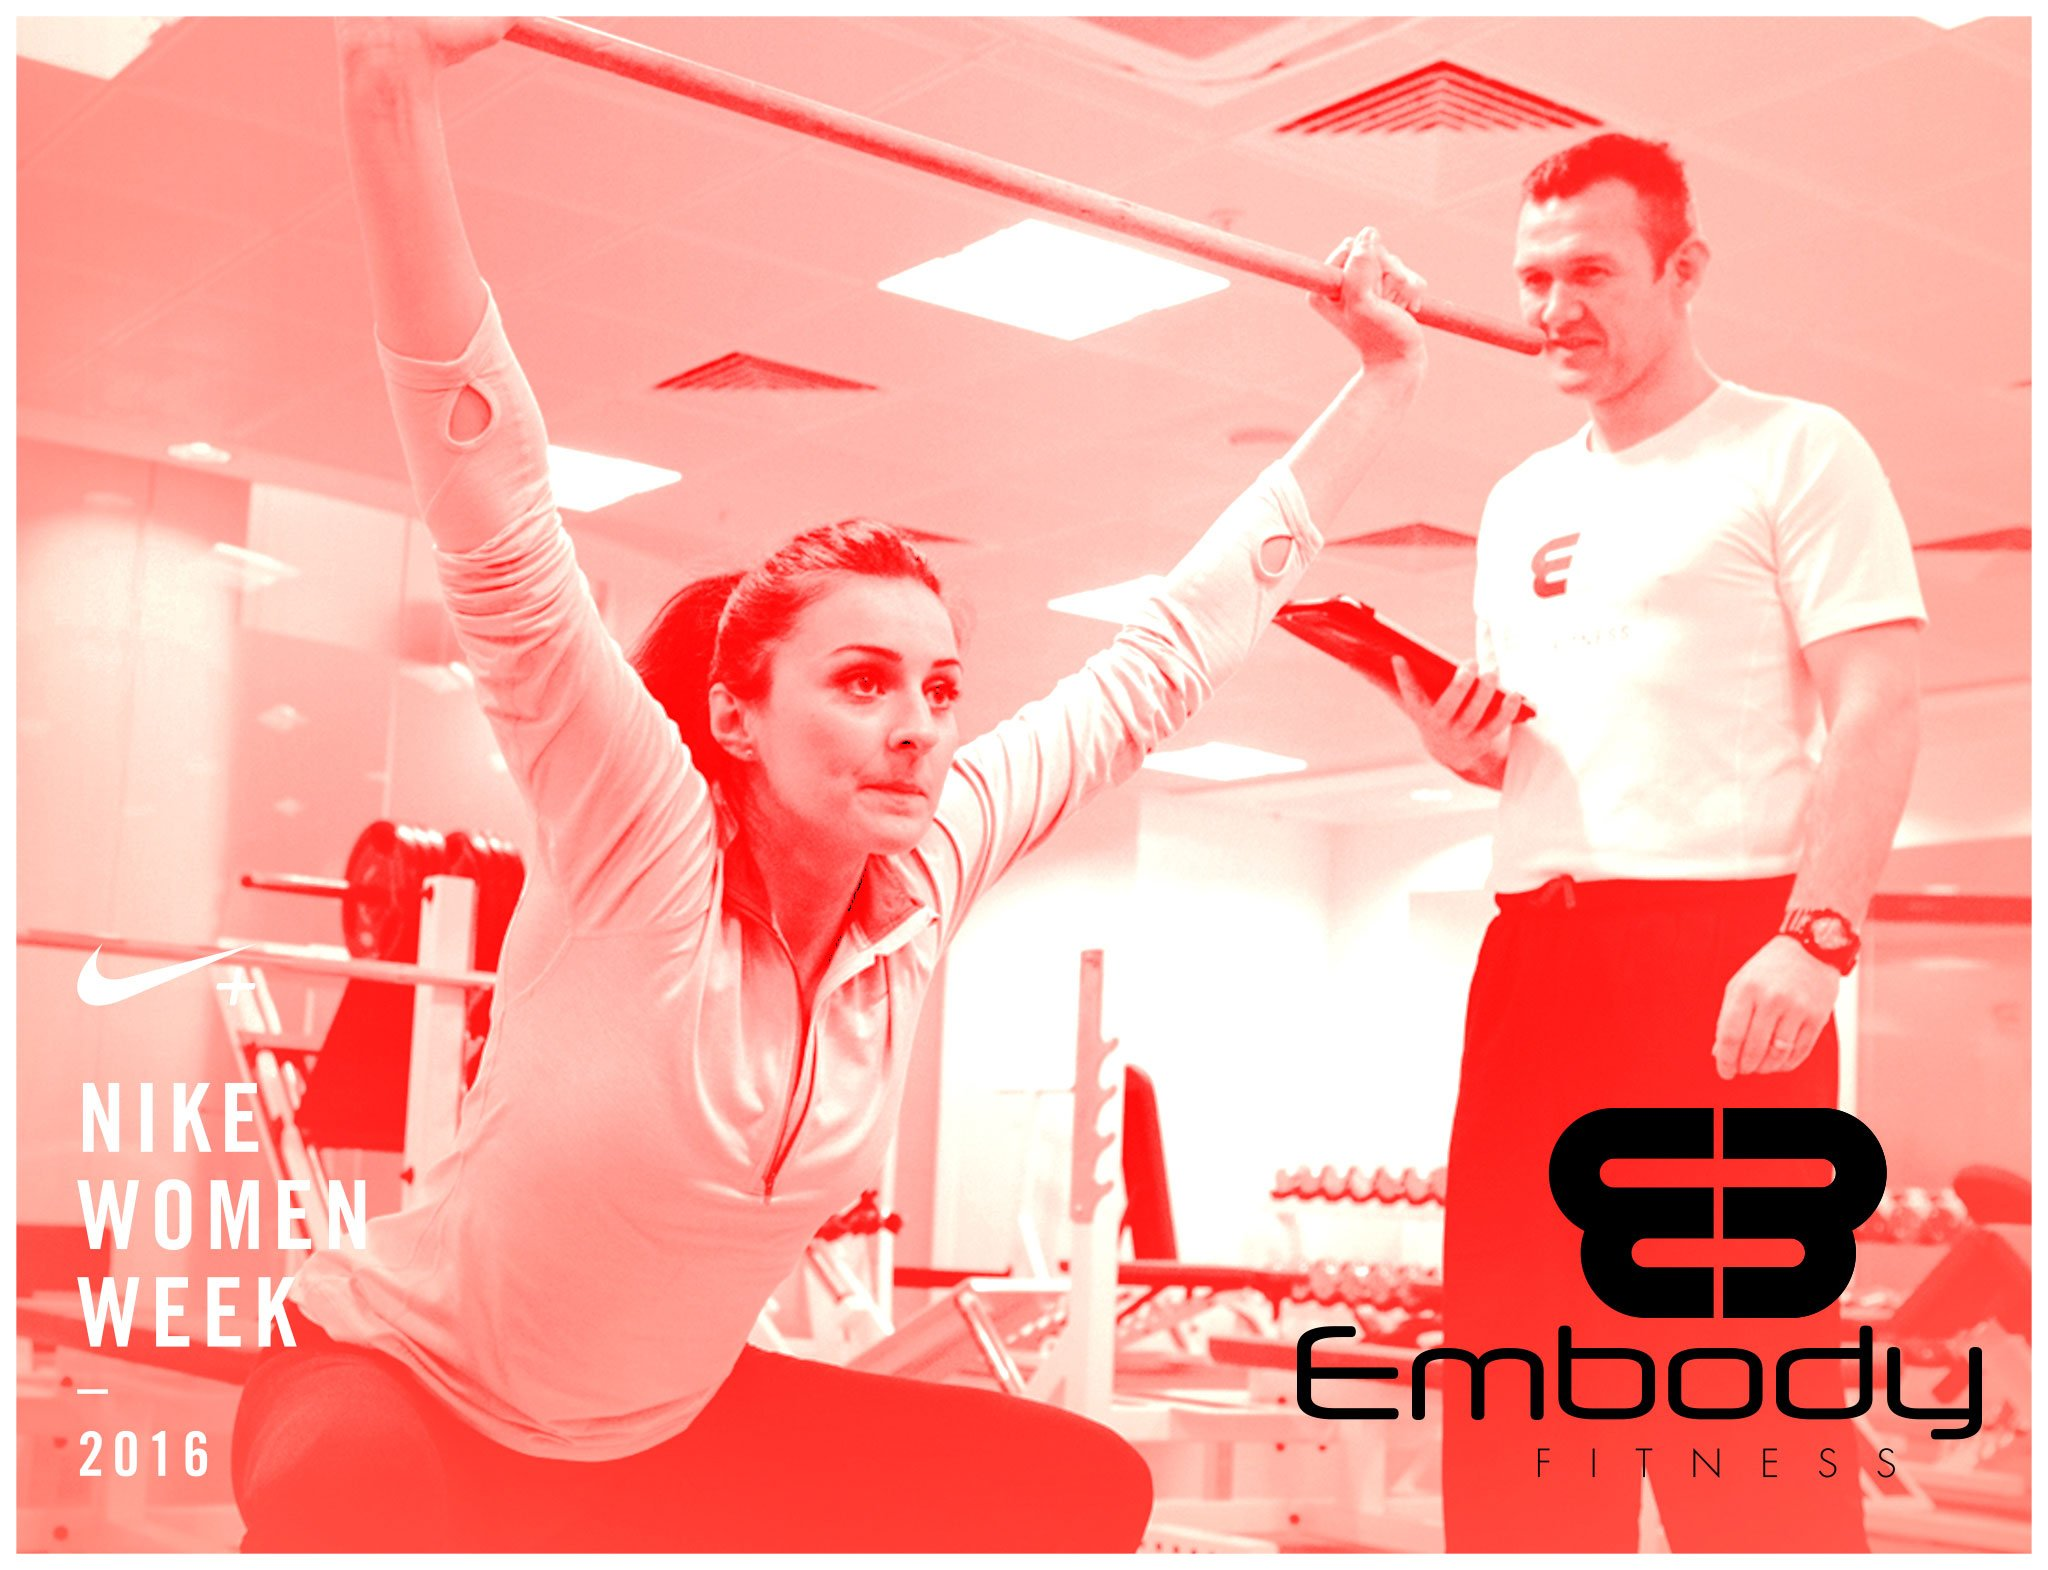 Personal Training Trainer London   Nike Women Week London January 18th, 2016